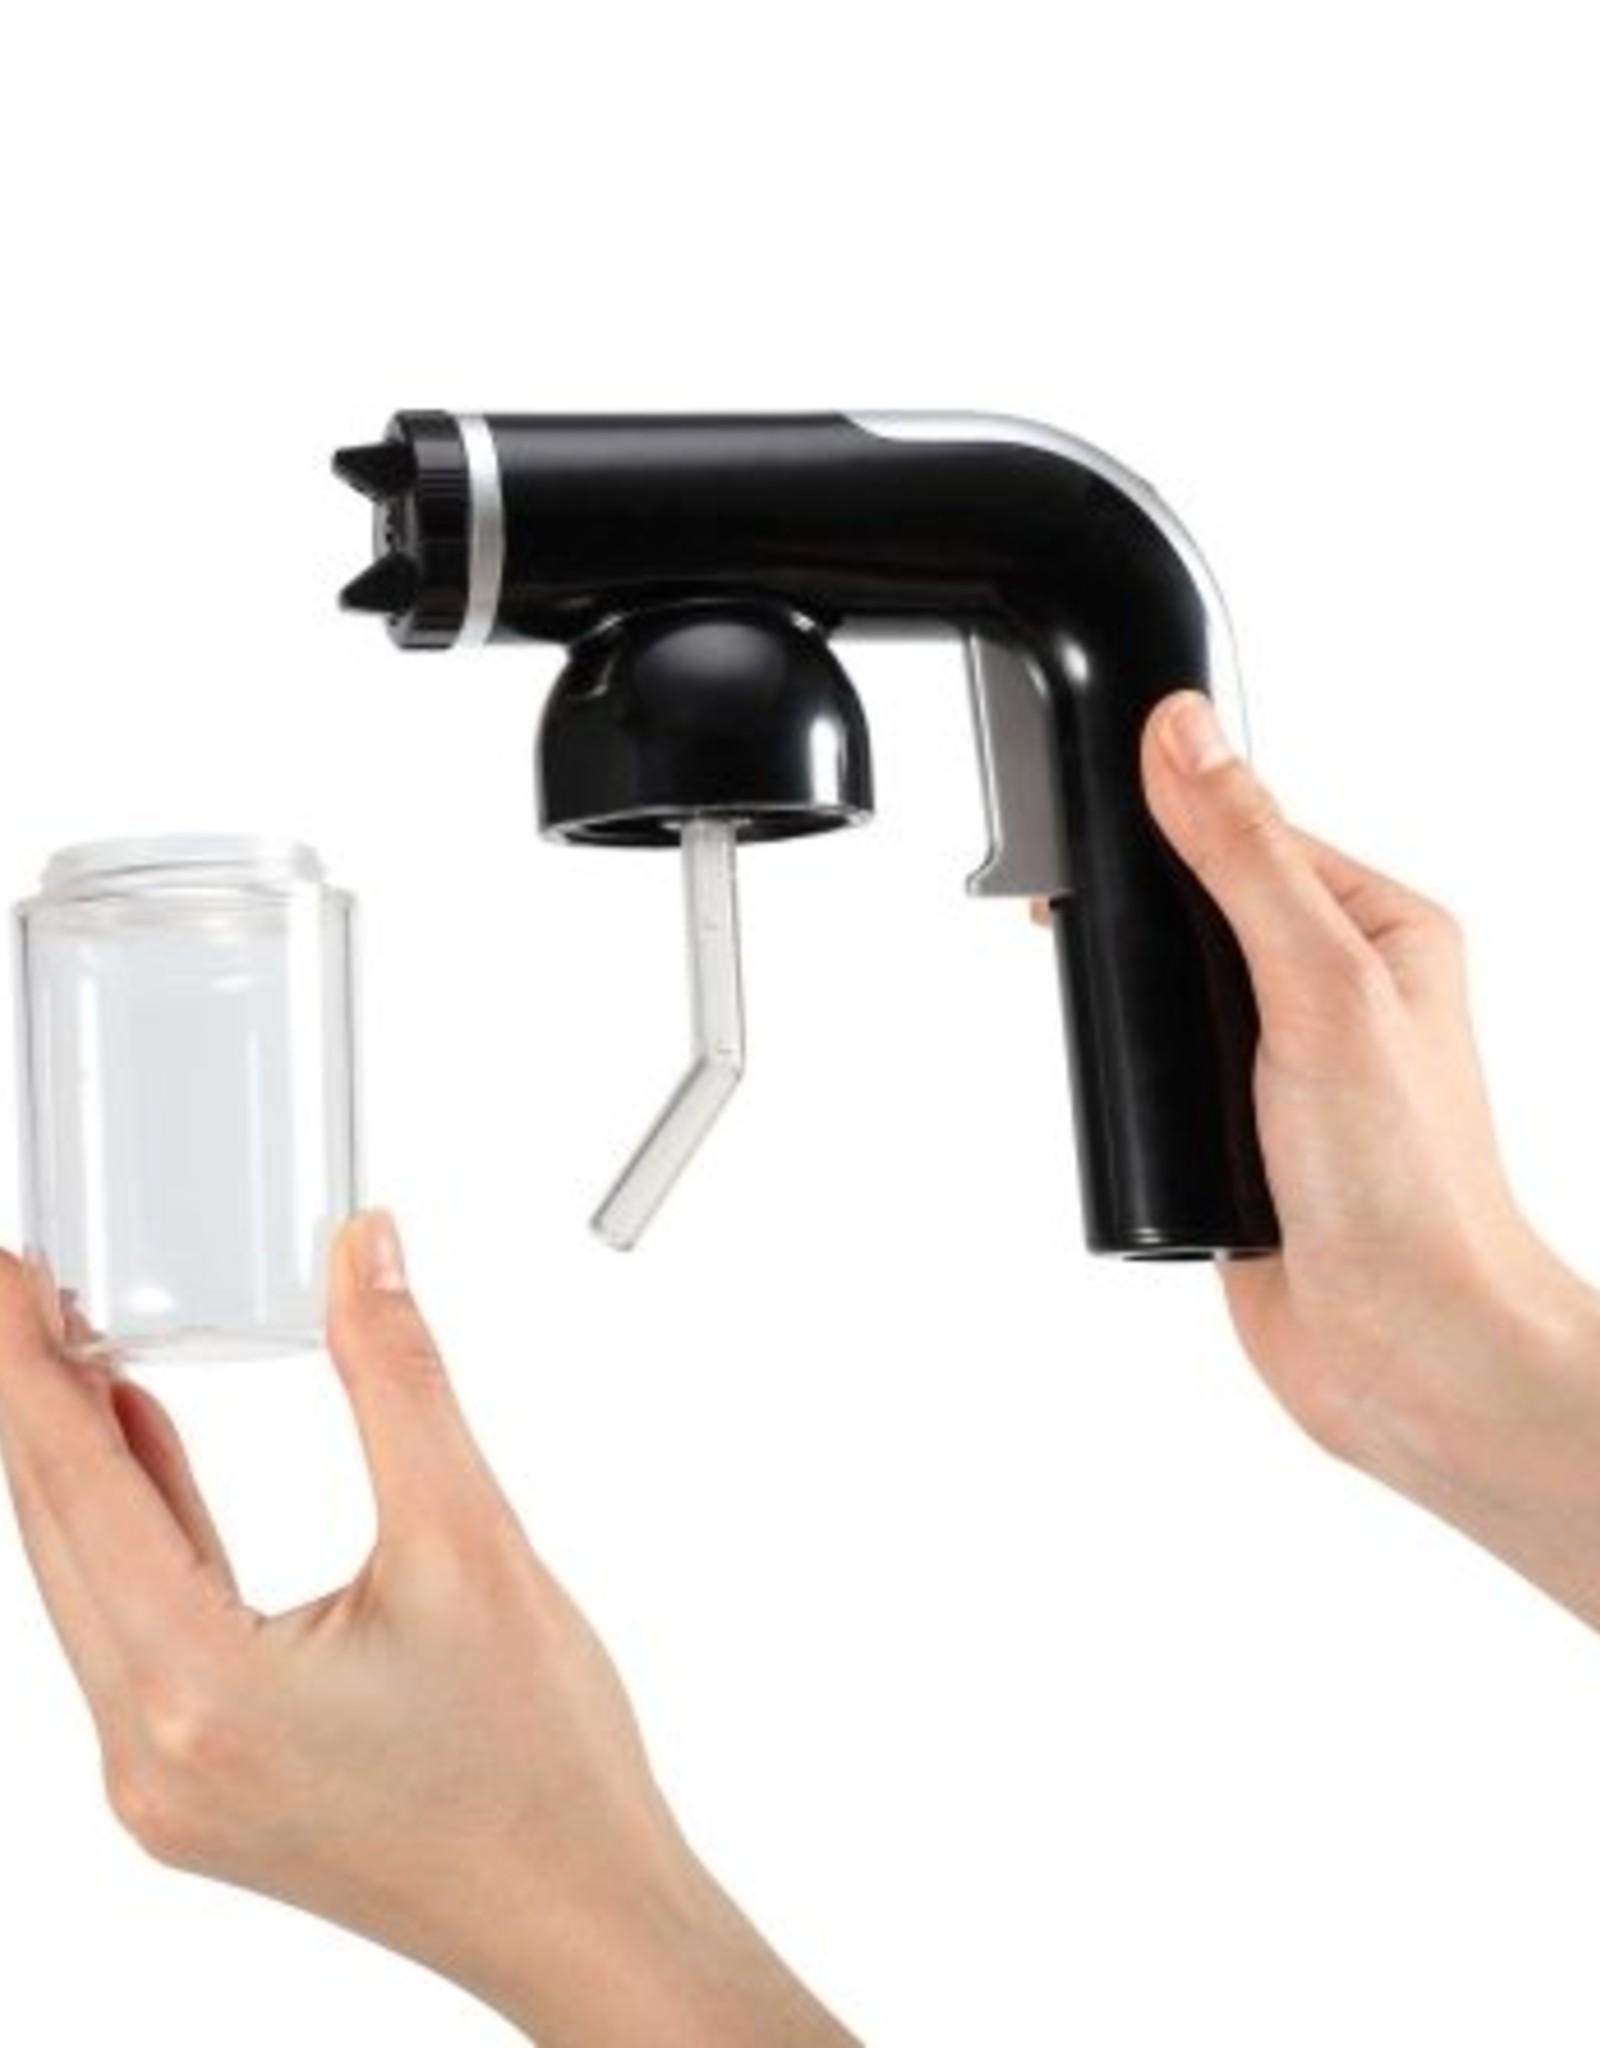 Tanning Essentials Tanning Essentials Rapid gun